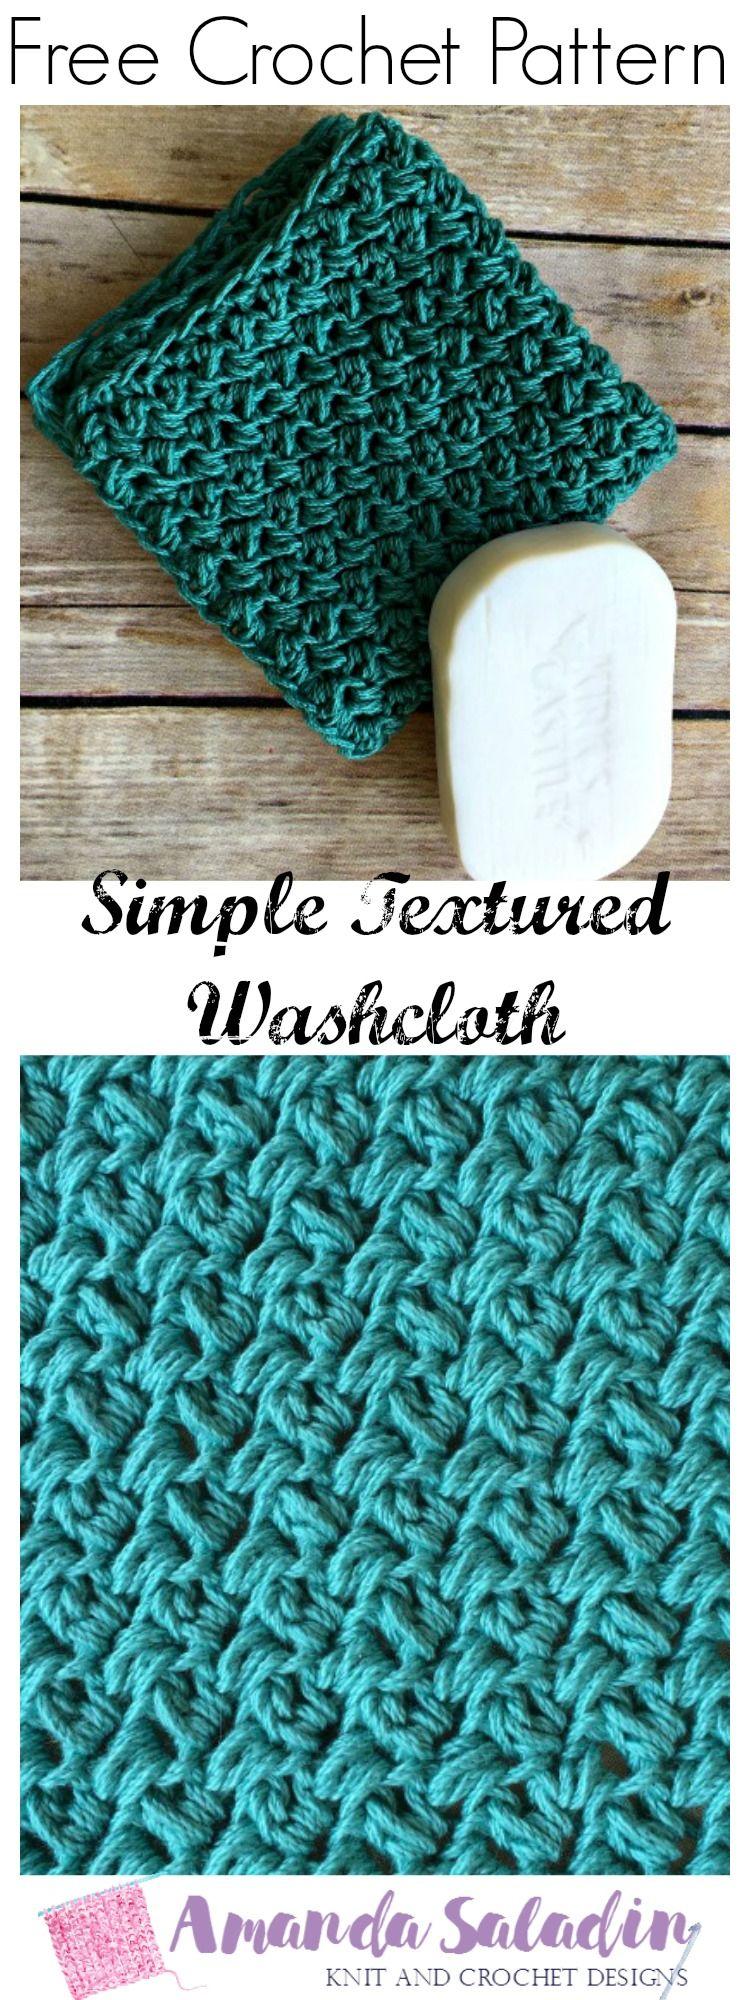 Simple Textured Washcloth - Free Crochet Pattern | Crochet delight ...